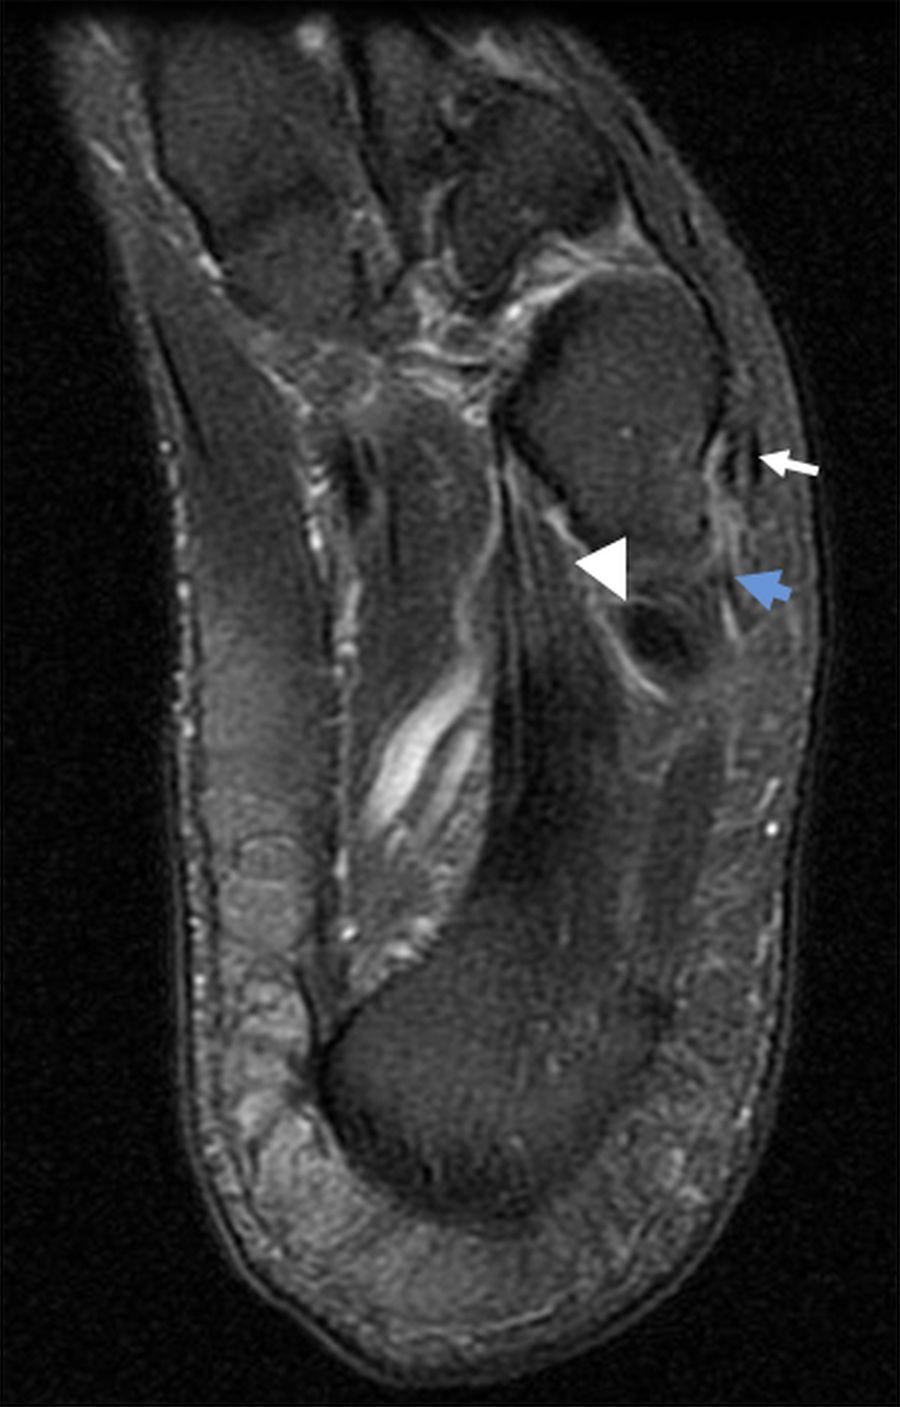 Cureus Peroneus Tertius Tendon Tear A Rare Cause Of Lateral Ankle